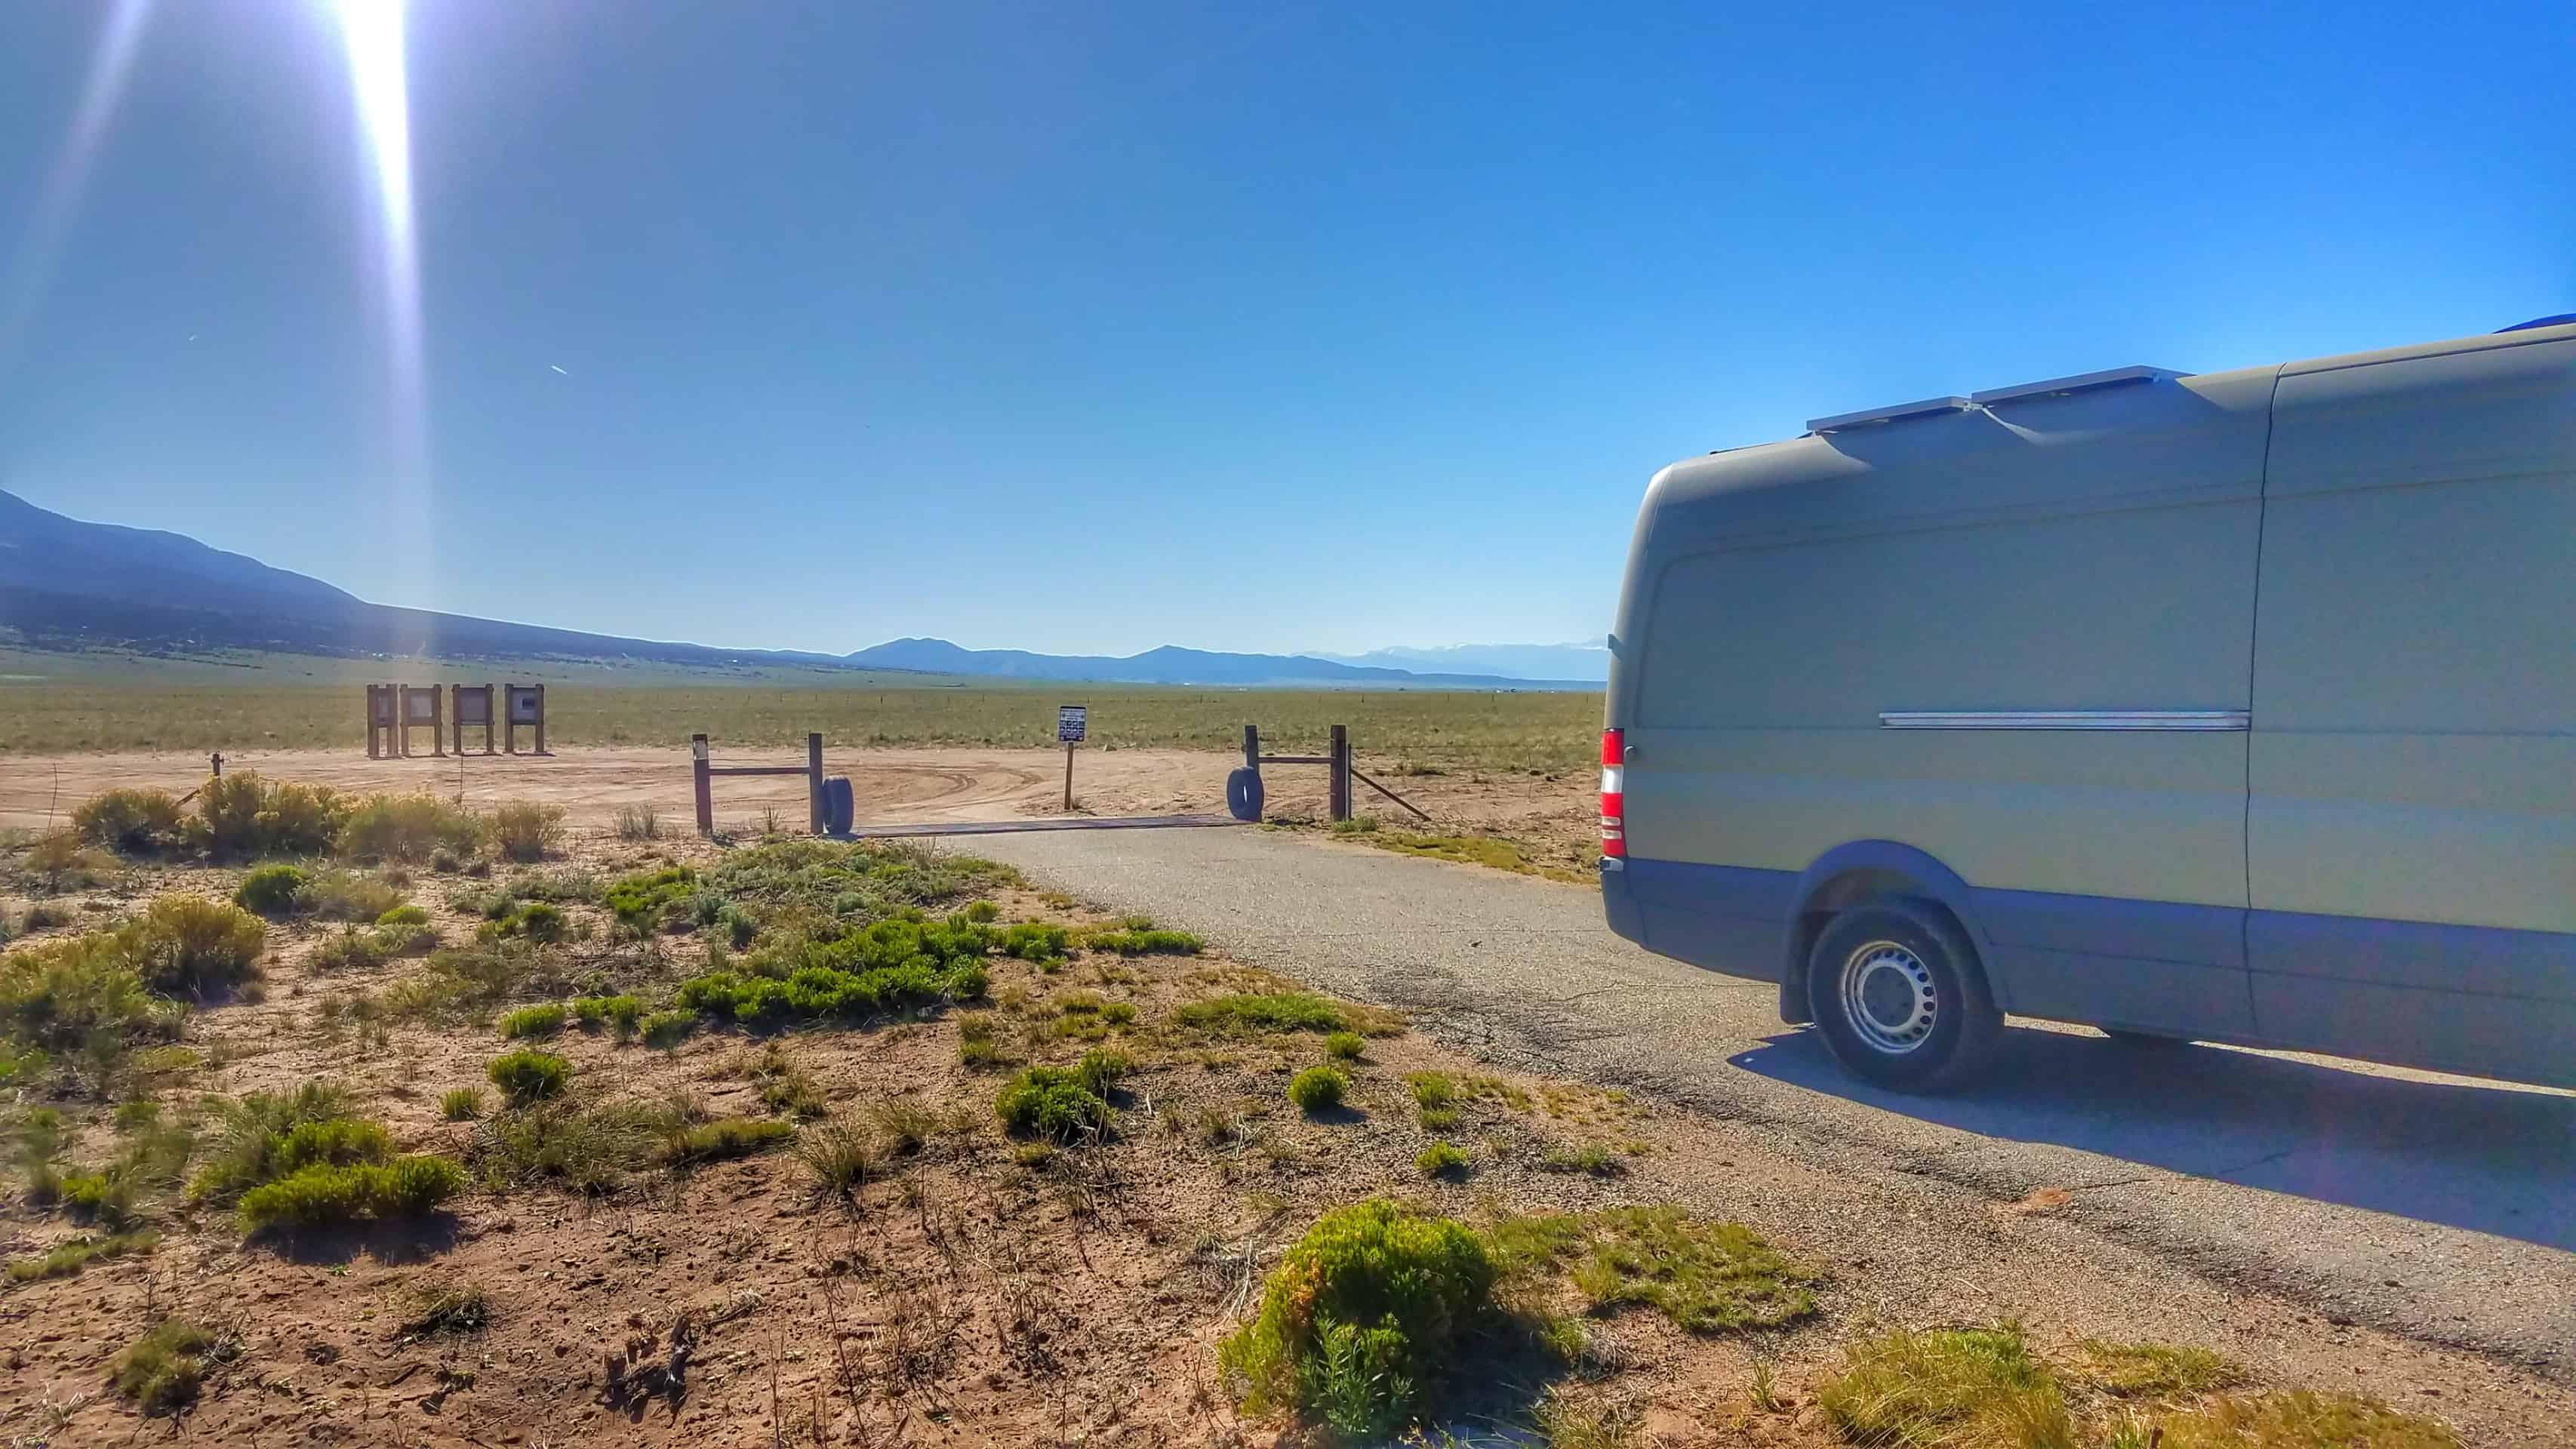 Boondocking Great Sand Dunes National Park 3